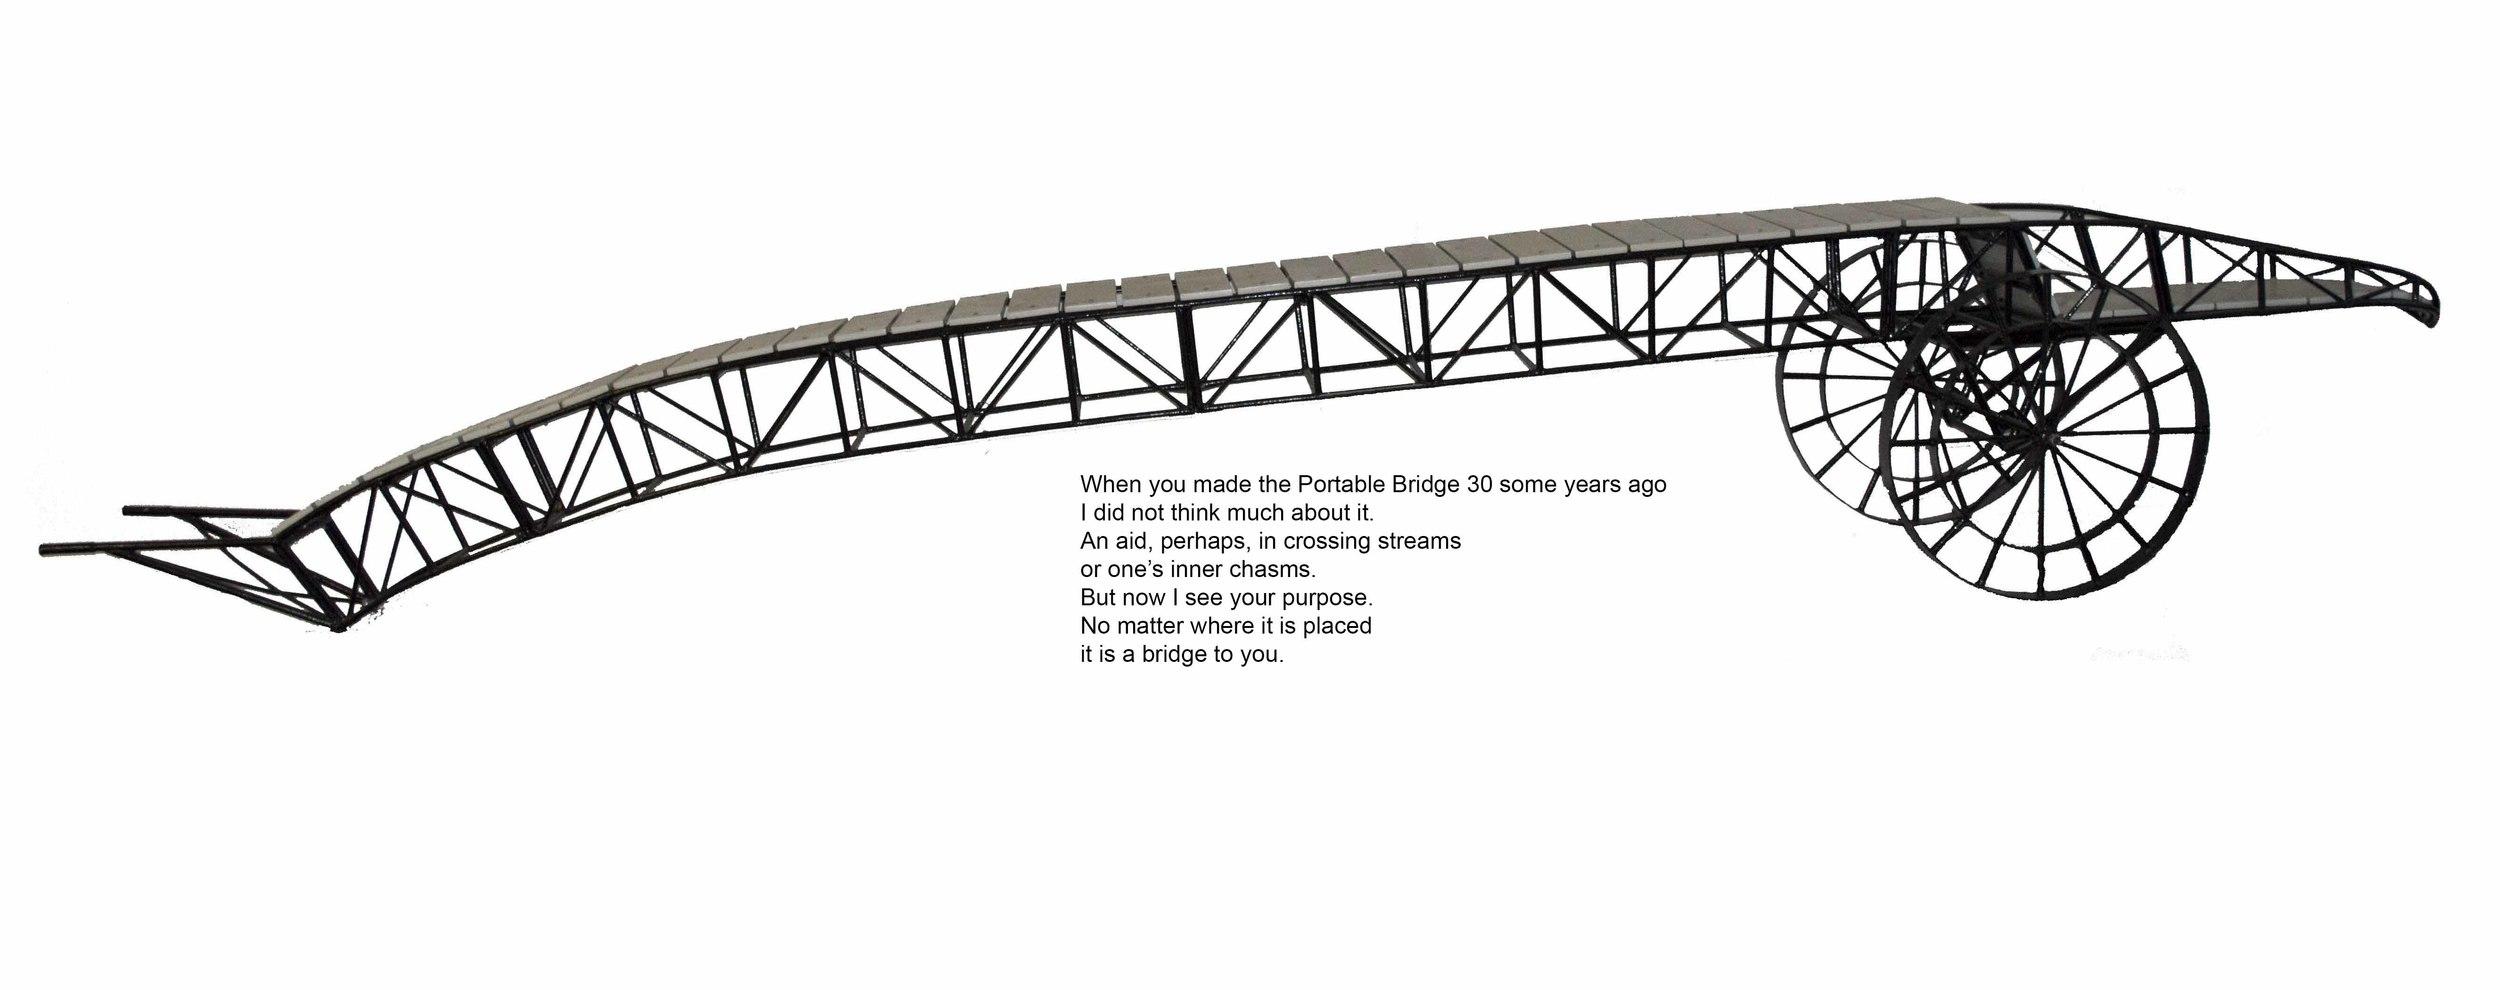 The Portable Bridge 1983